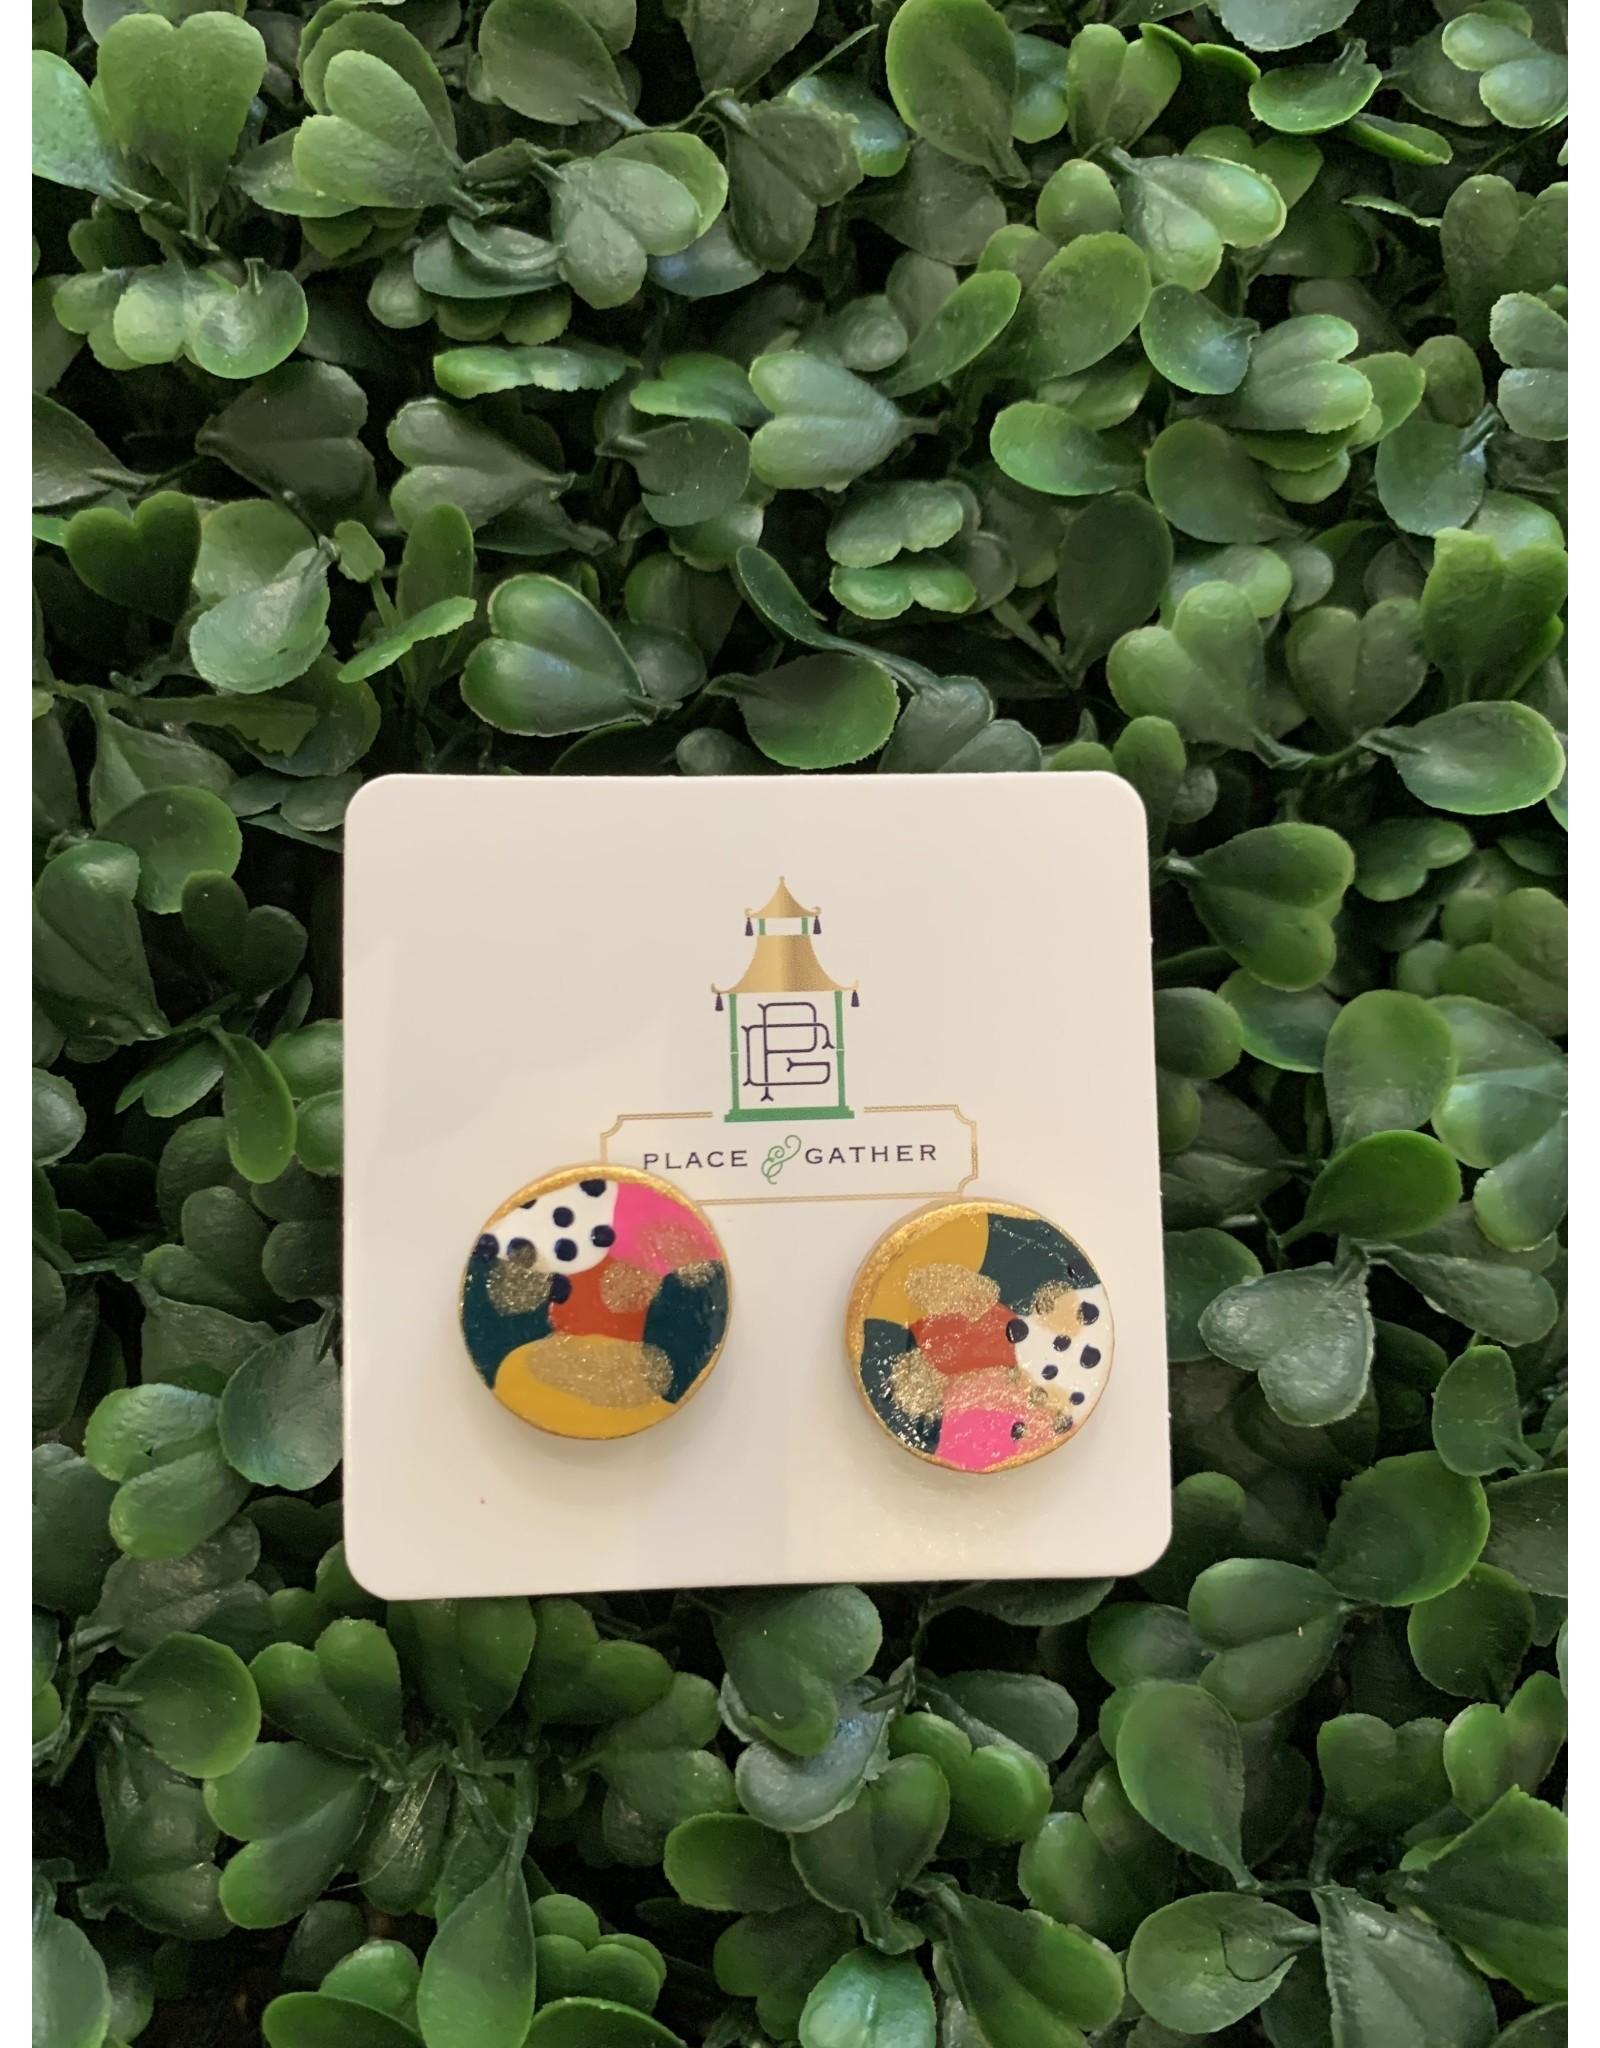 Musgrove & Main Handpainted Polka Dot & Glittered Stud